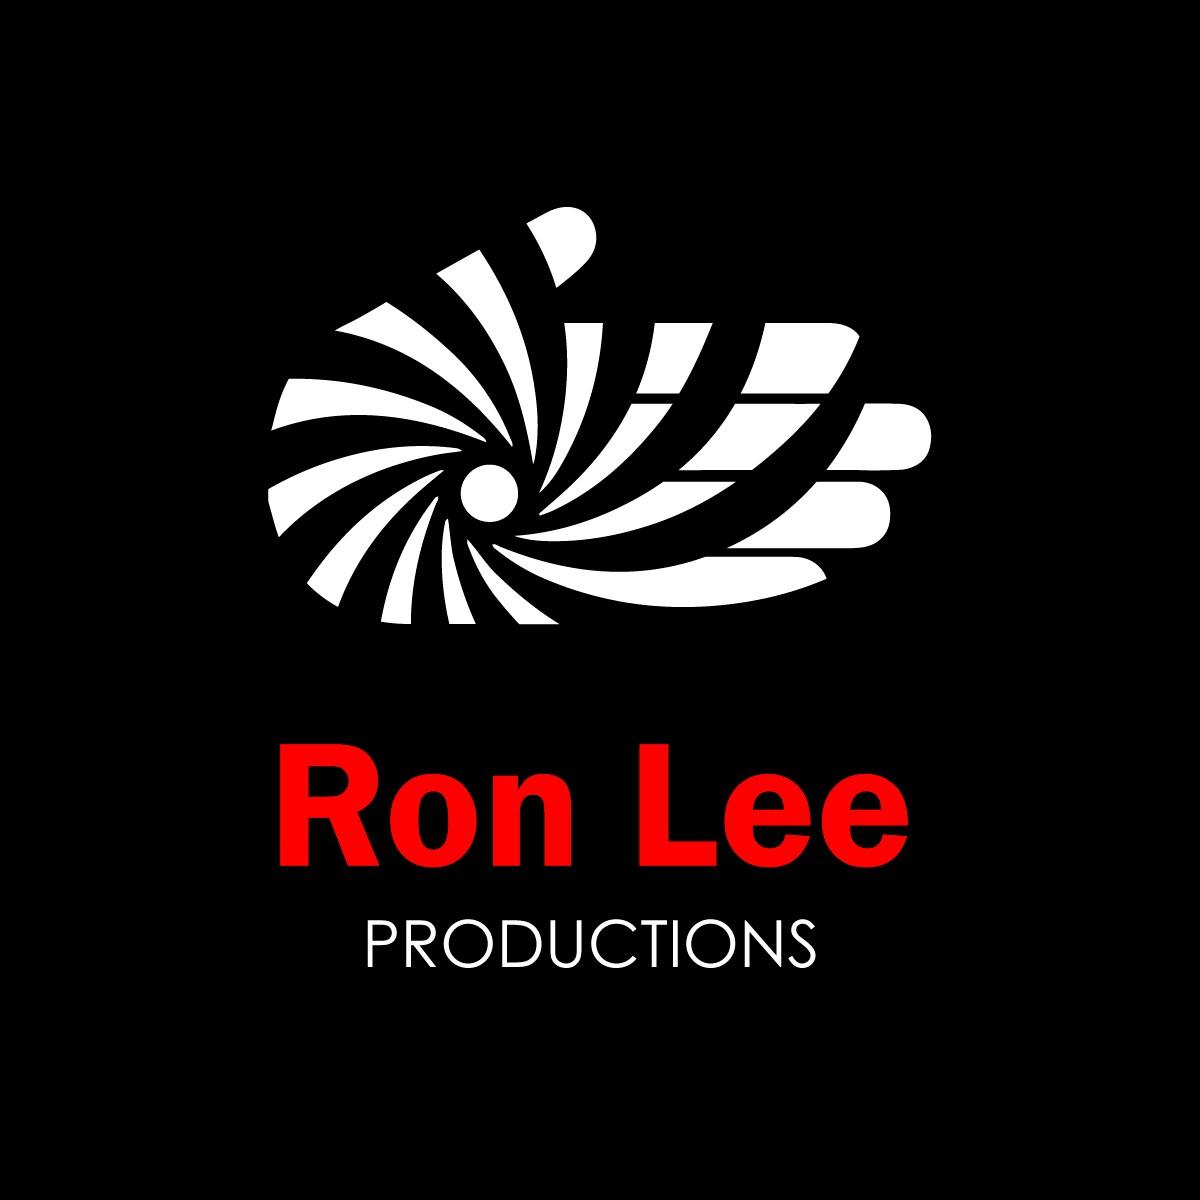 Design a mysterious, sleek logo for a film production company.